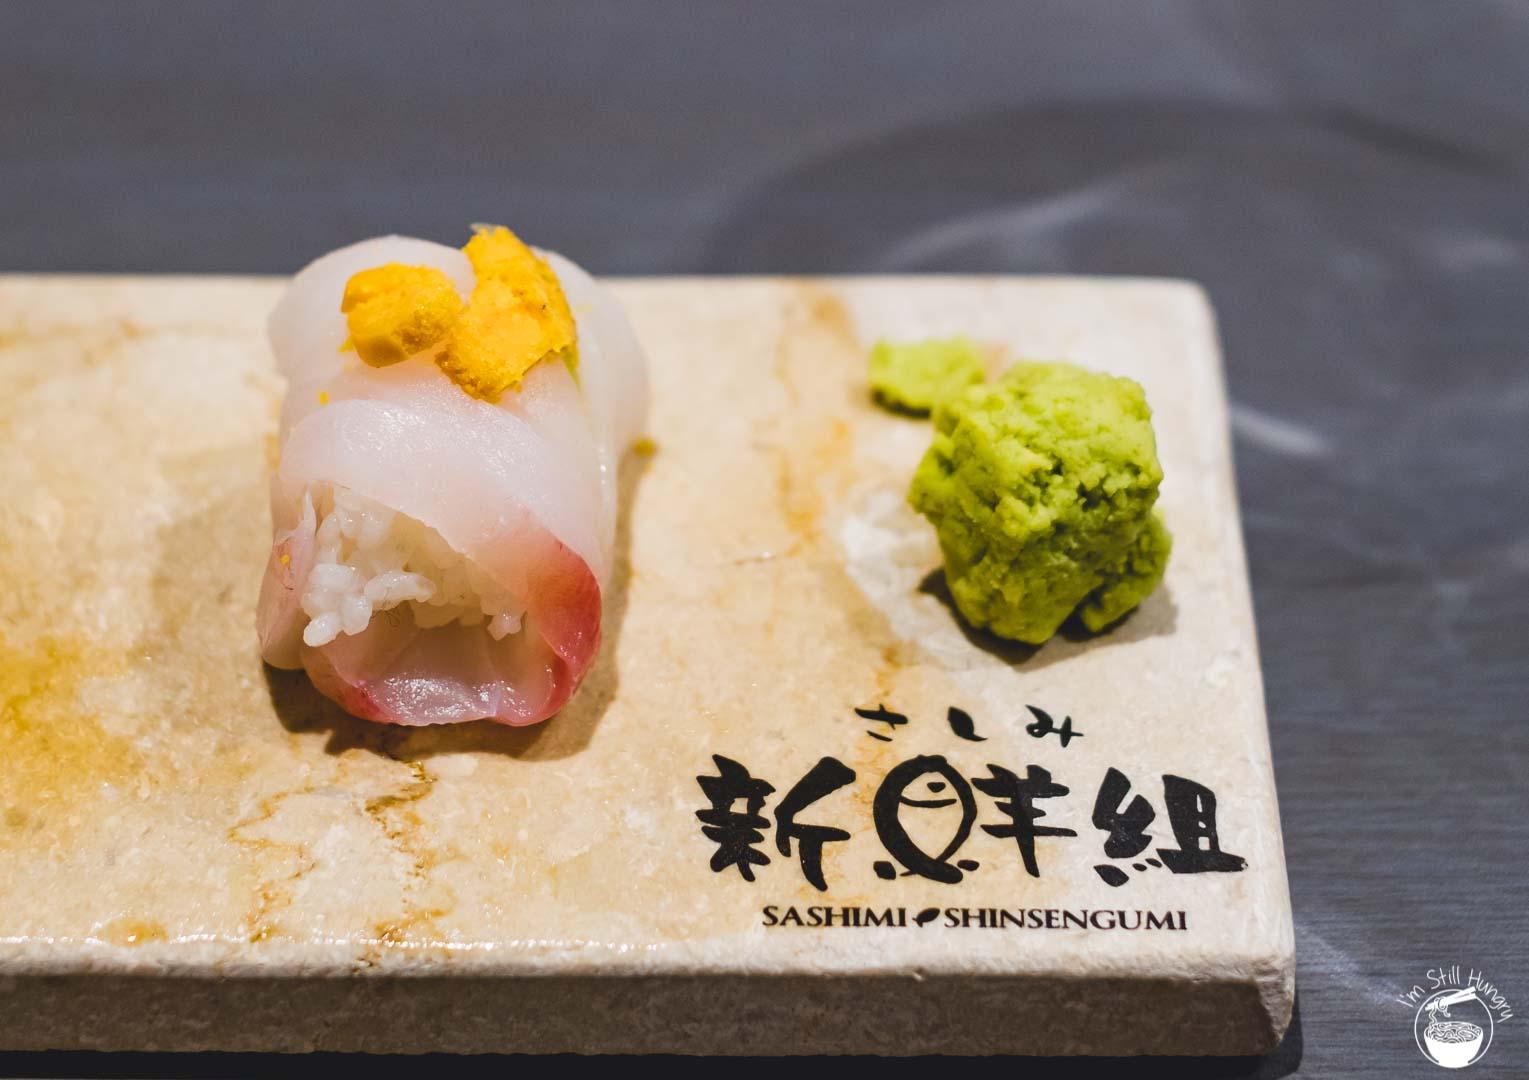 Sashimi Shinsengumi Crows Nest Sushi Omakase Snapper w/sea urchin on top